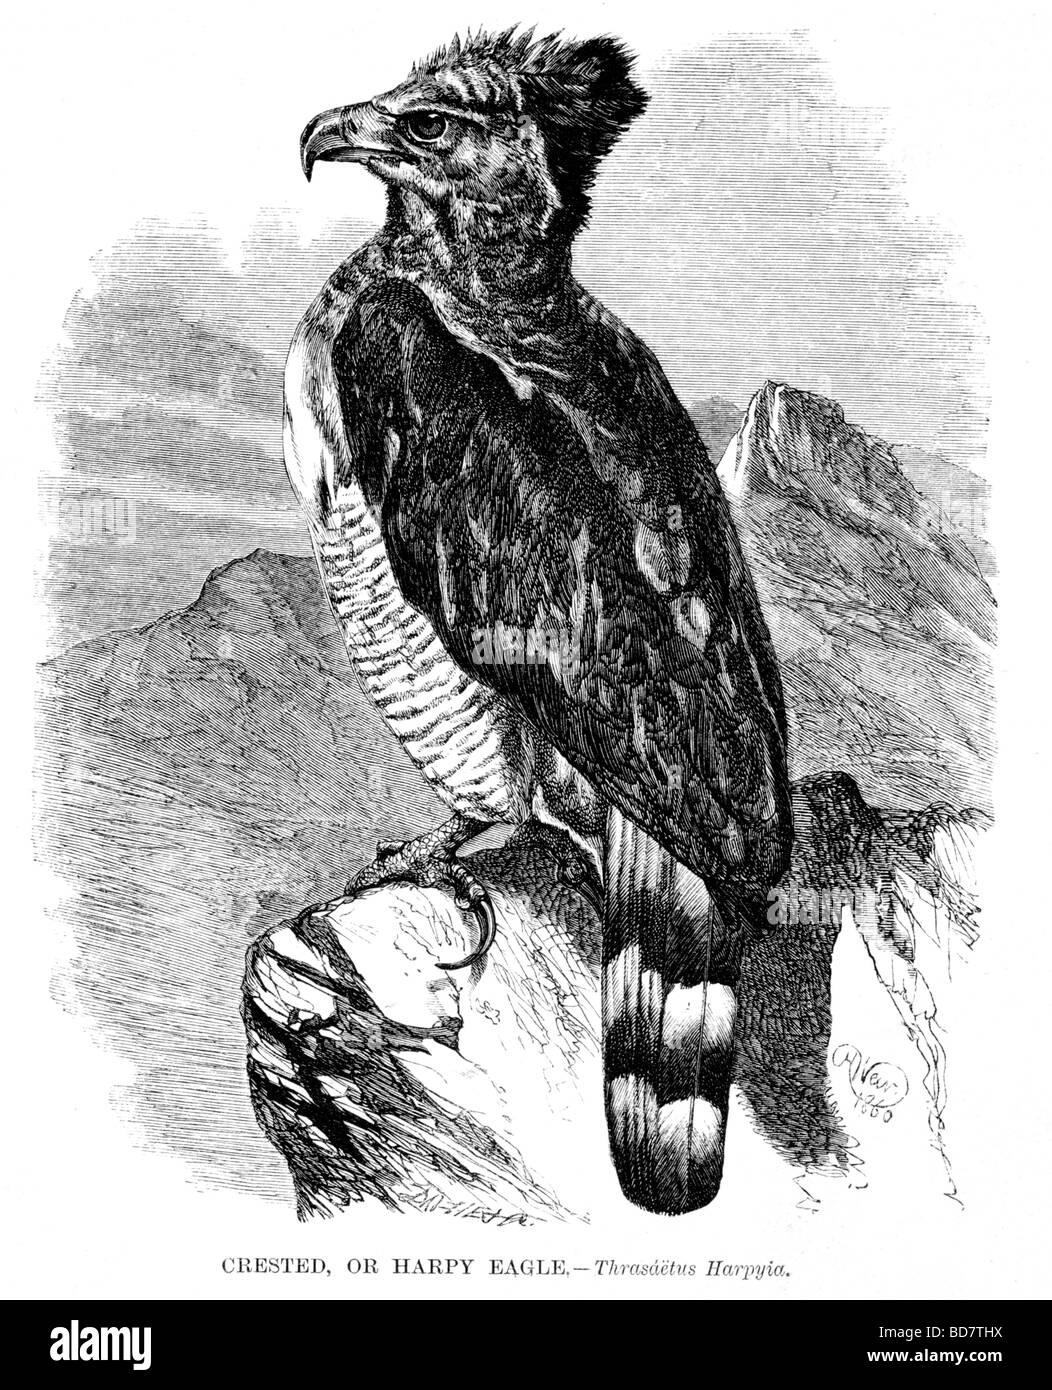 crested or harpy eagle thrasaetus harpyia bird of prey - Stock Image